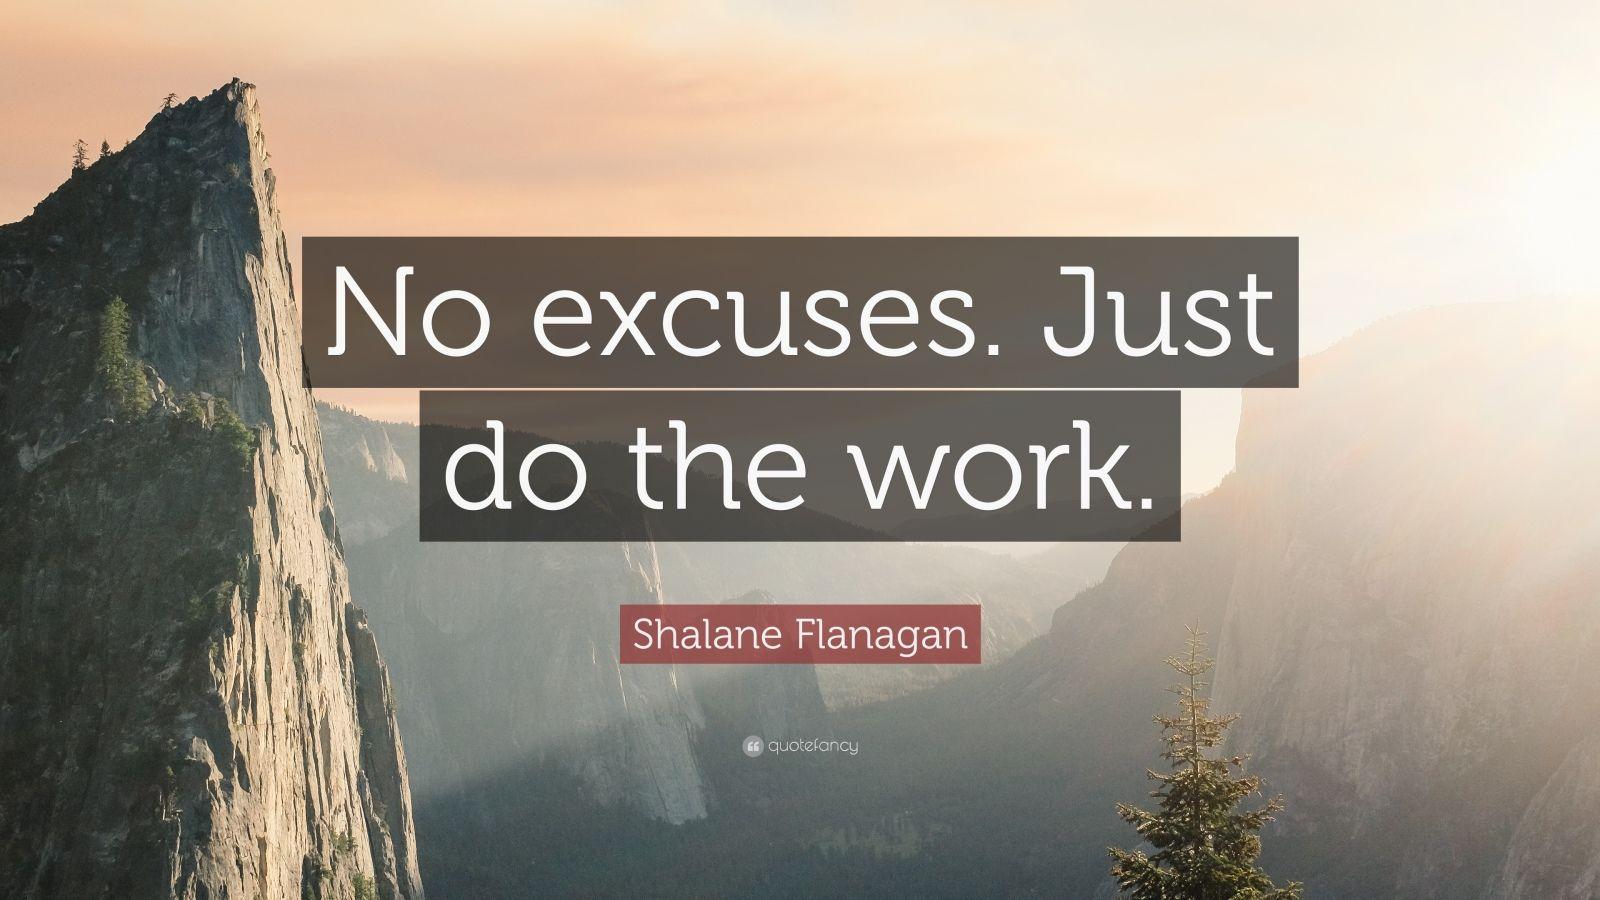 Swami Vivekananda Quotes Wallpaper Shalane Flanagan Quote No Excuses Just Do The Work